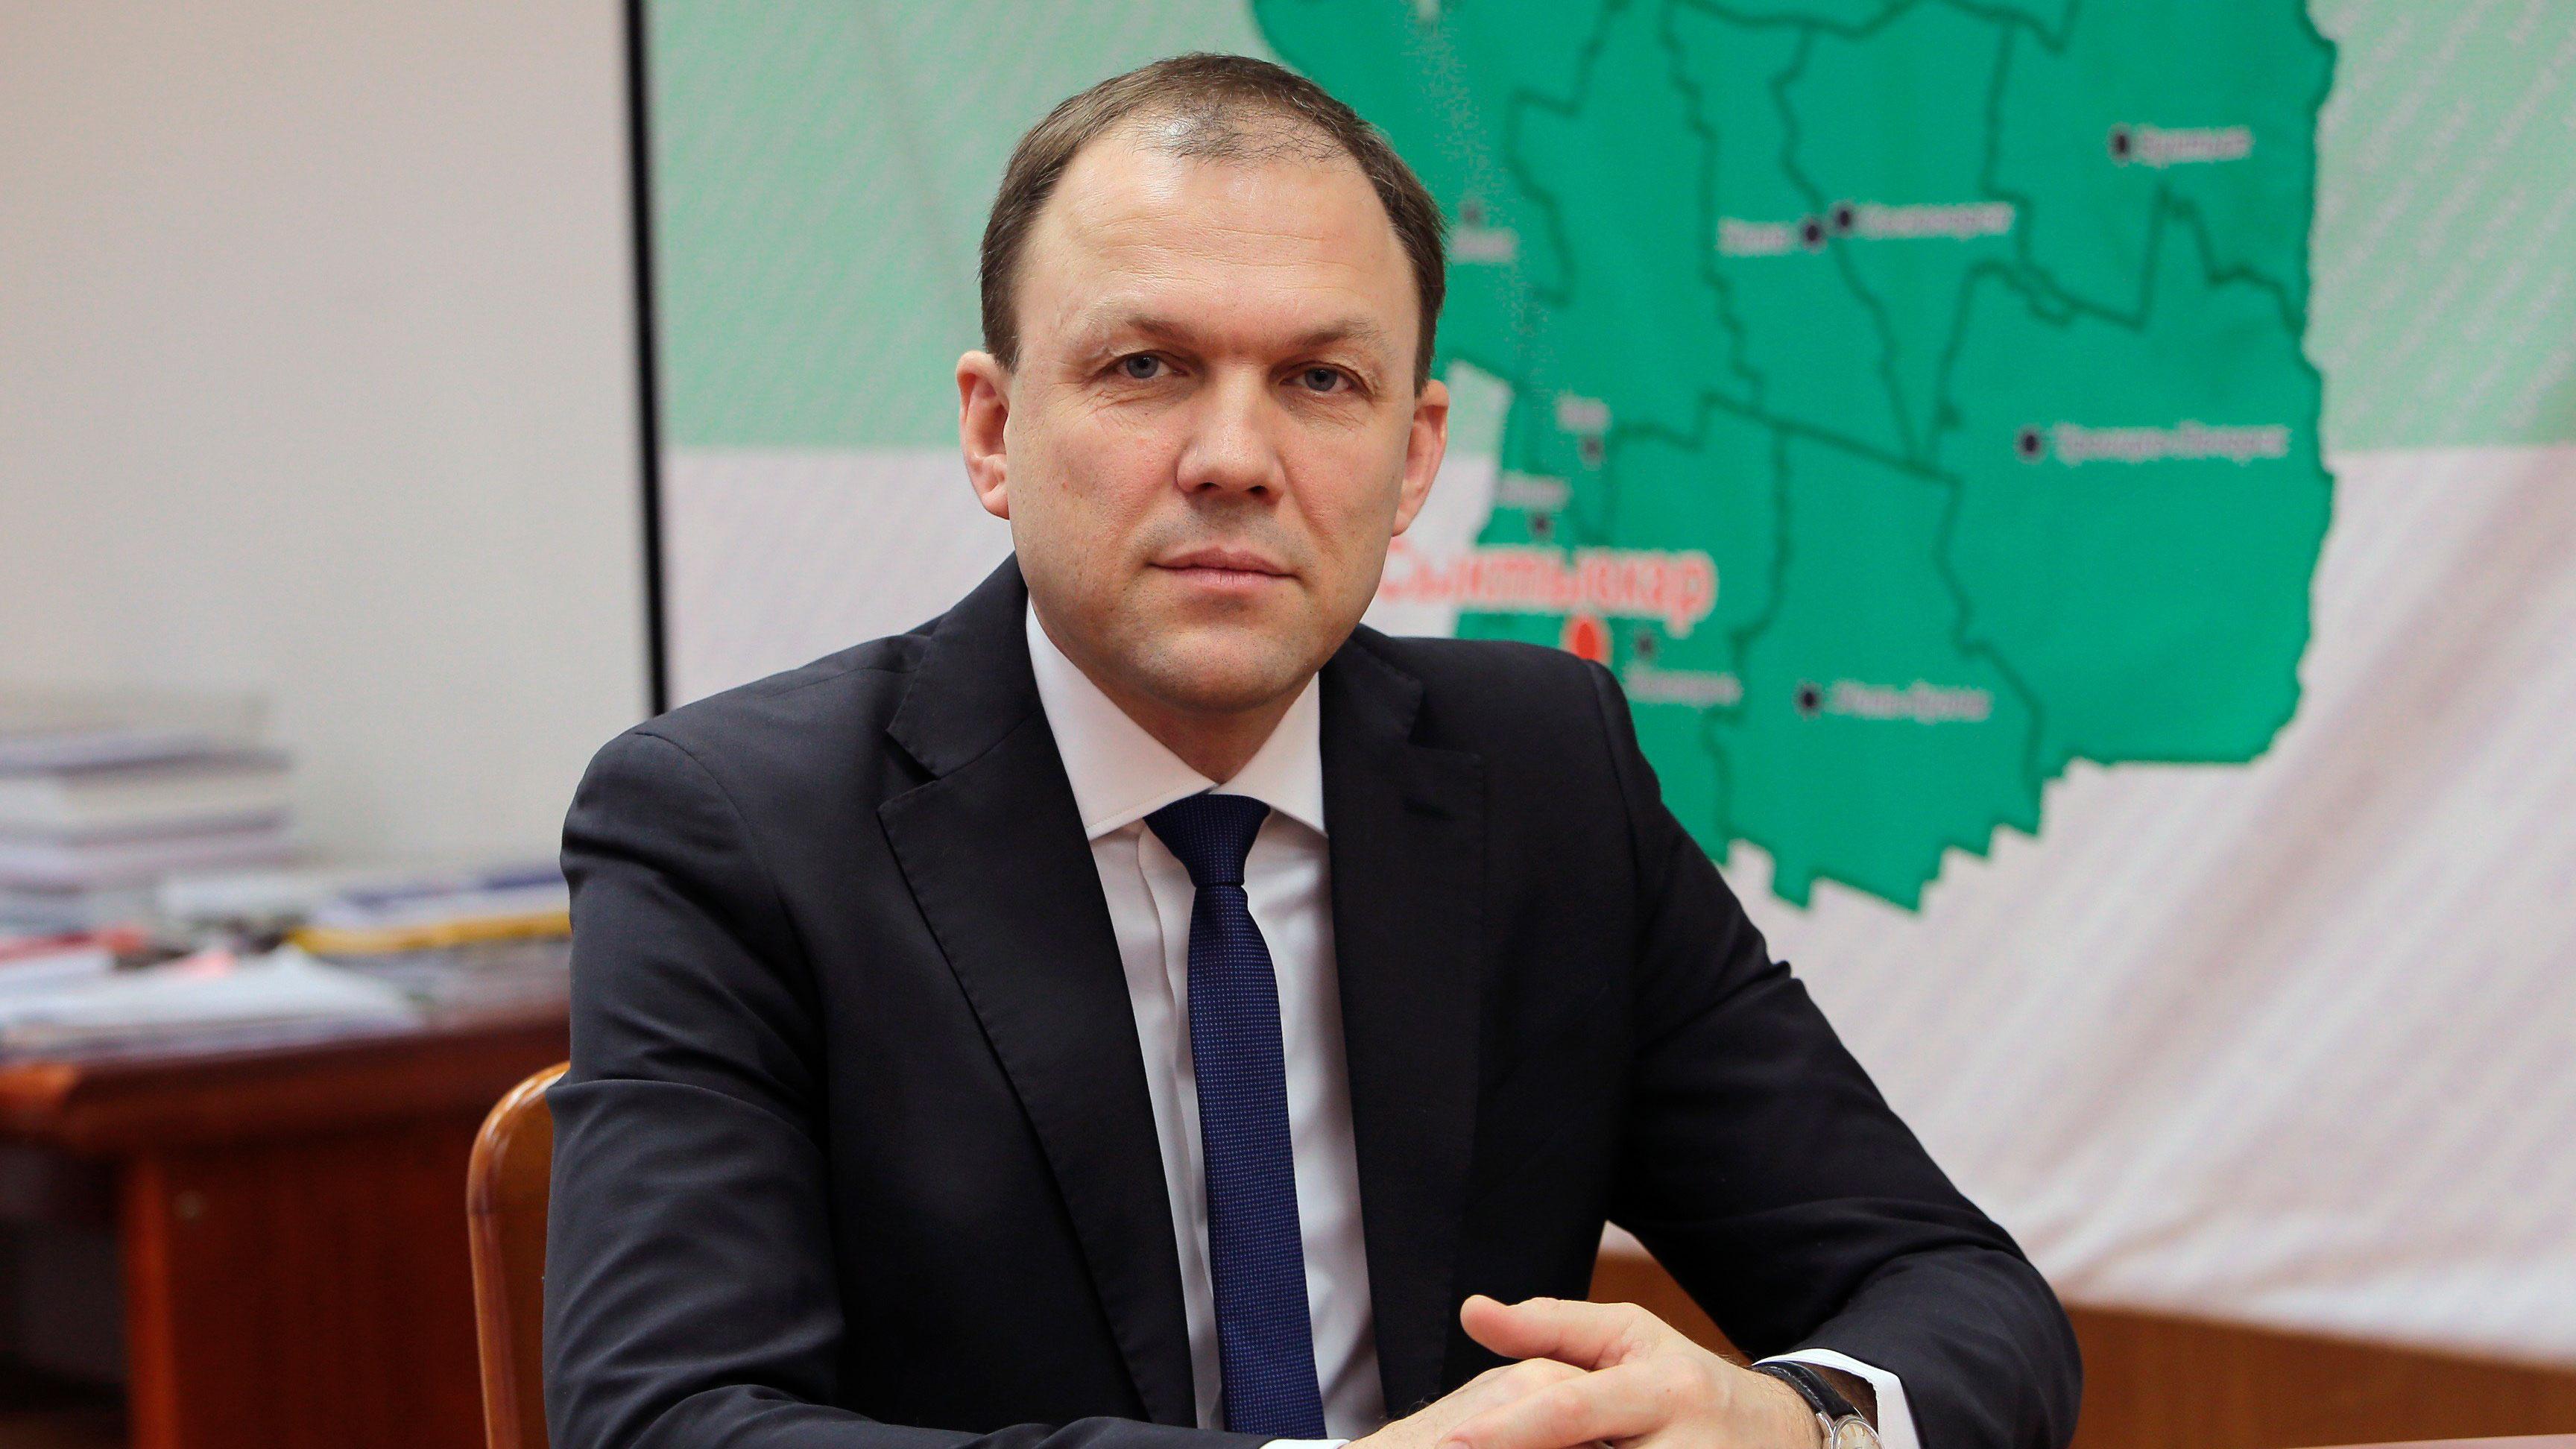 Глава Минздрава Республики Коми отправлен в отставку